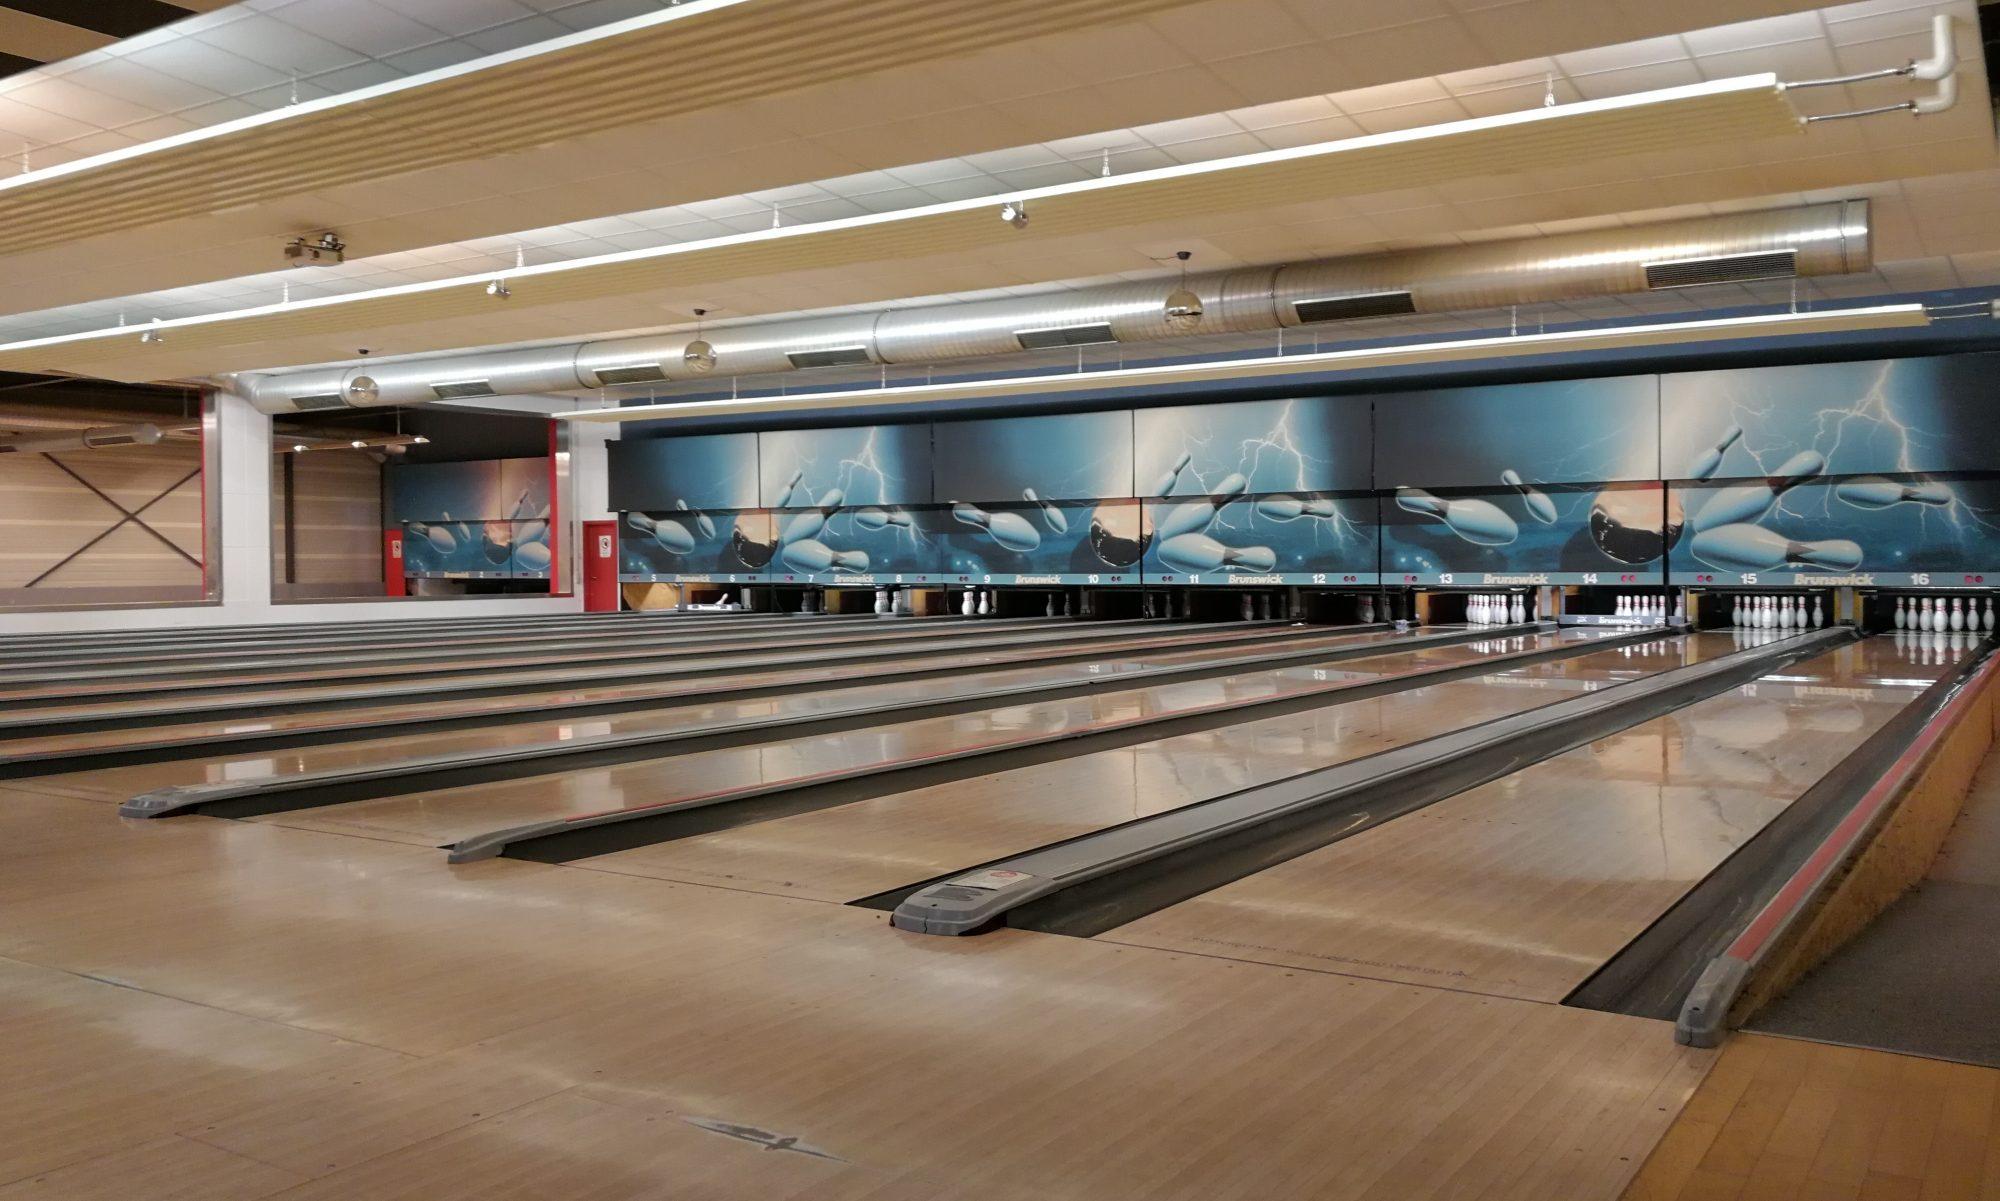 Bowlingverein Herbowlzheim